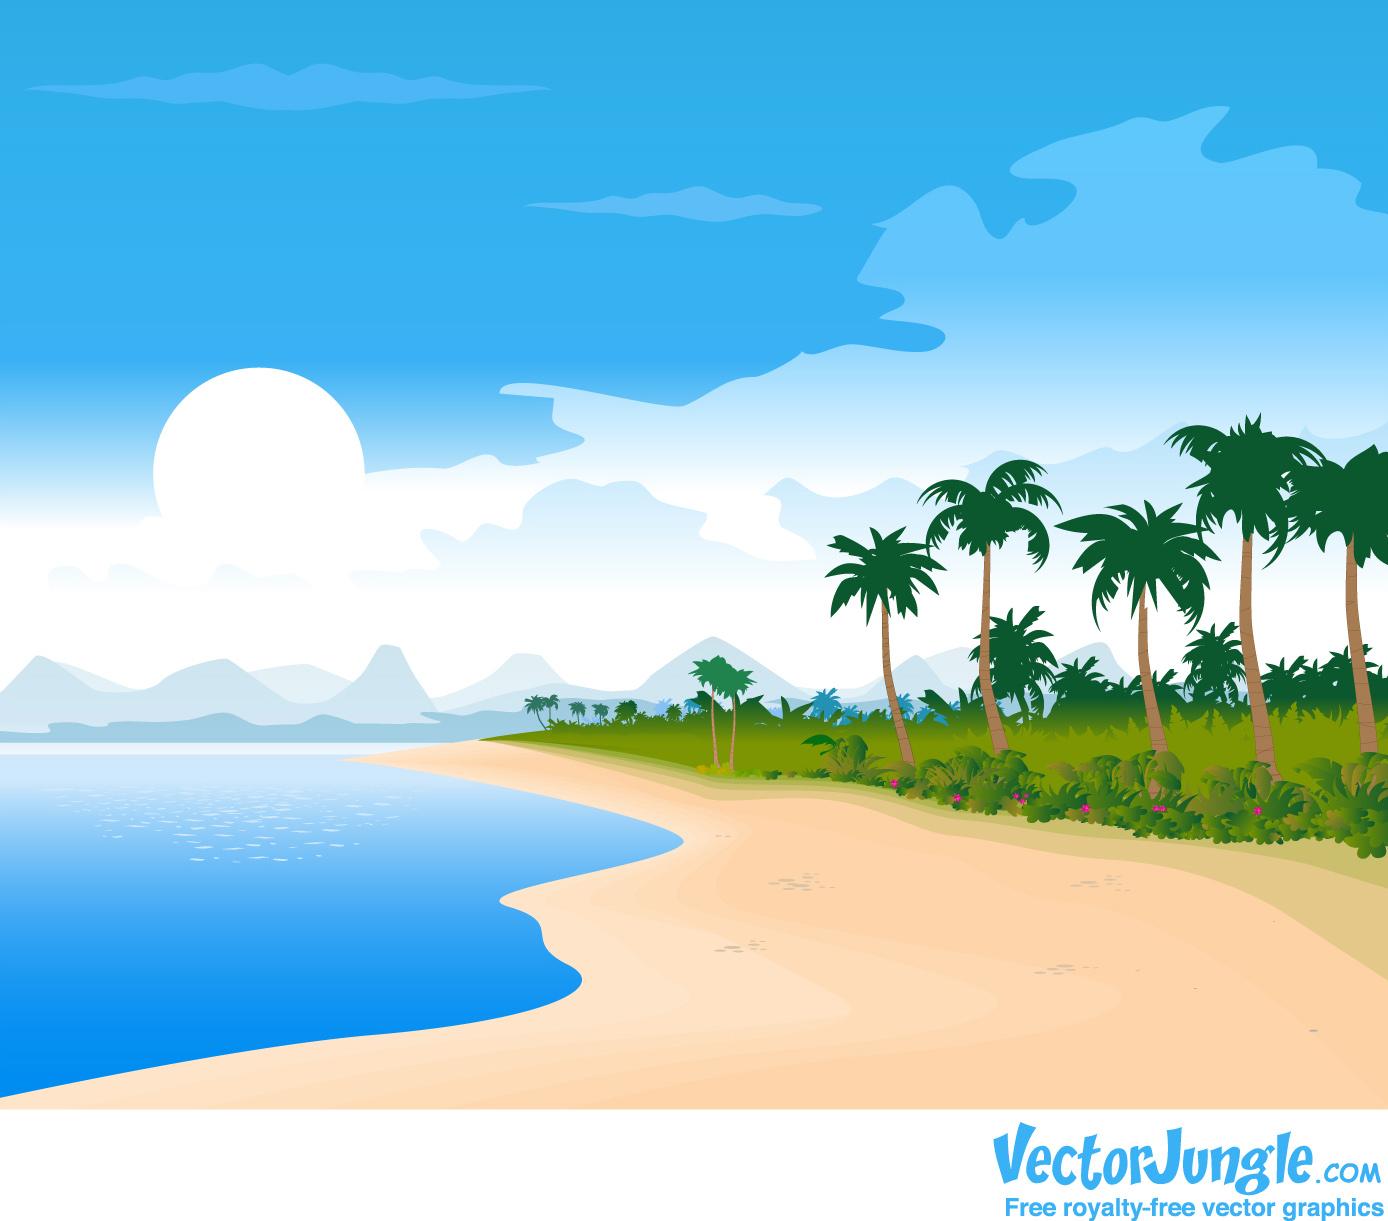 Cartoon Beach Wallpaper Cartoon Images-Cartoon Beach Wallpaper Cartoon Images-12